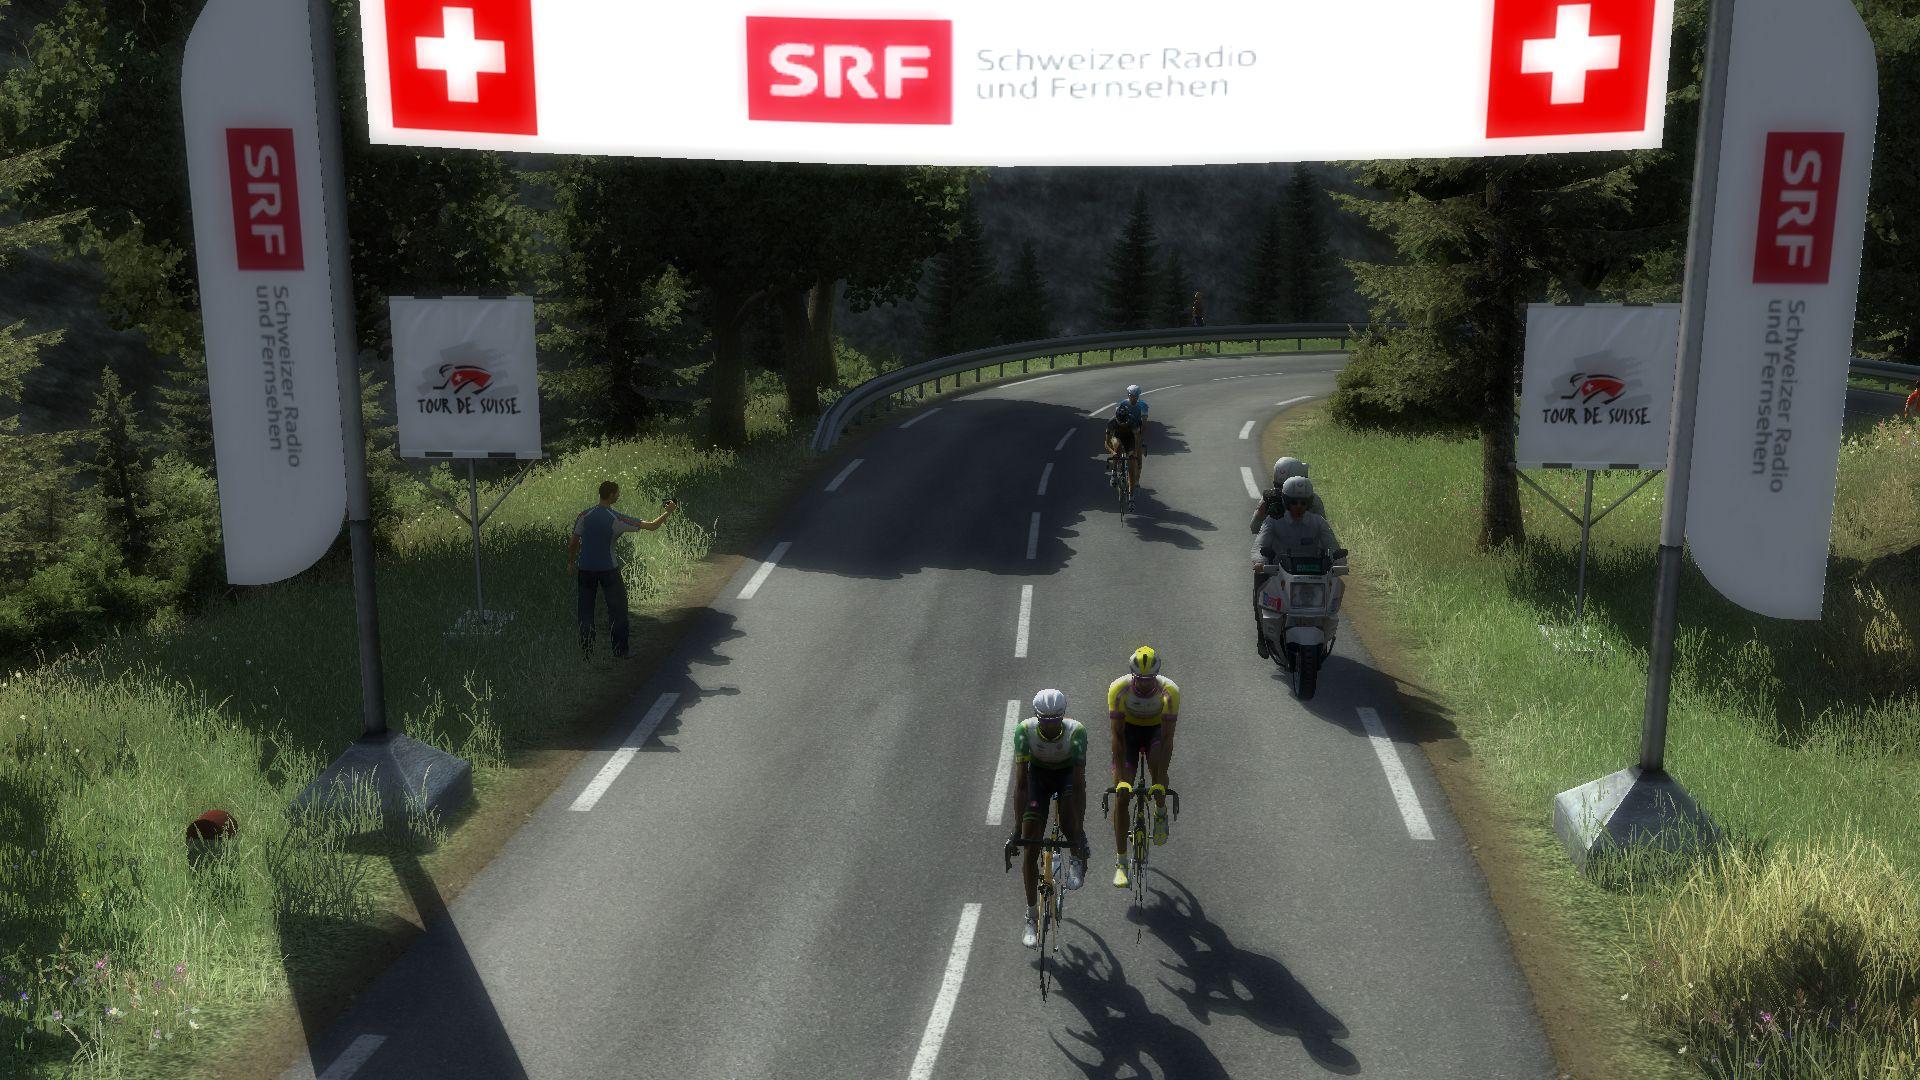 pcmdaily.com/images/mg/2017/Races/U23/Avenir/AVES7%208.jpg